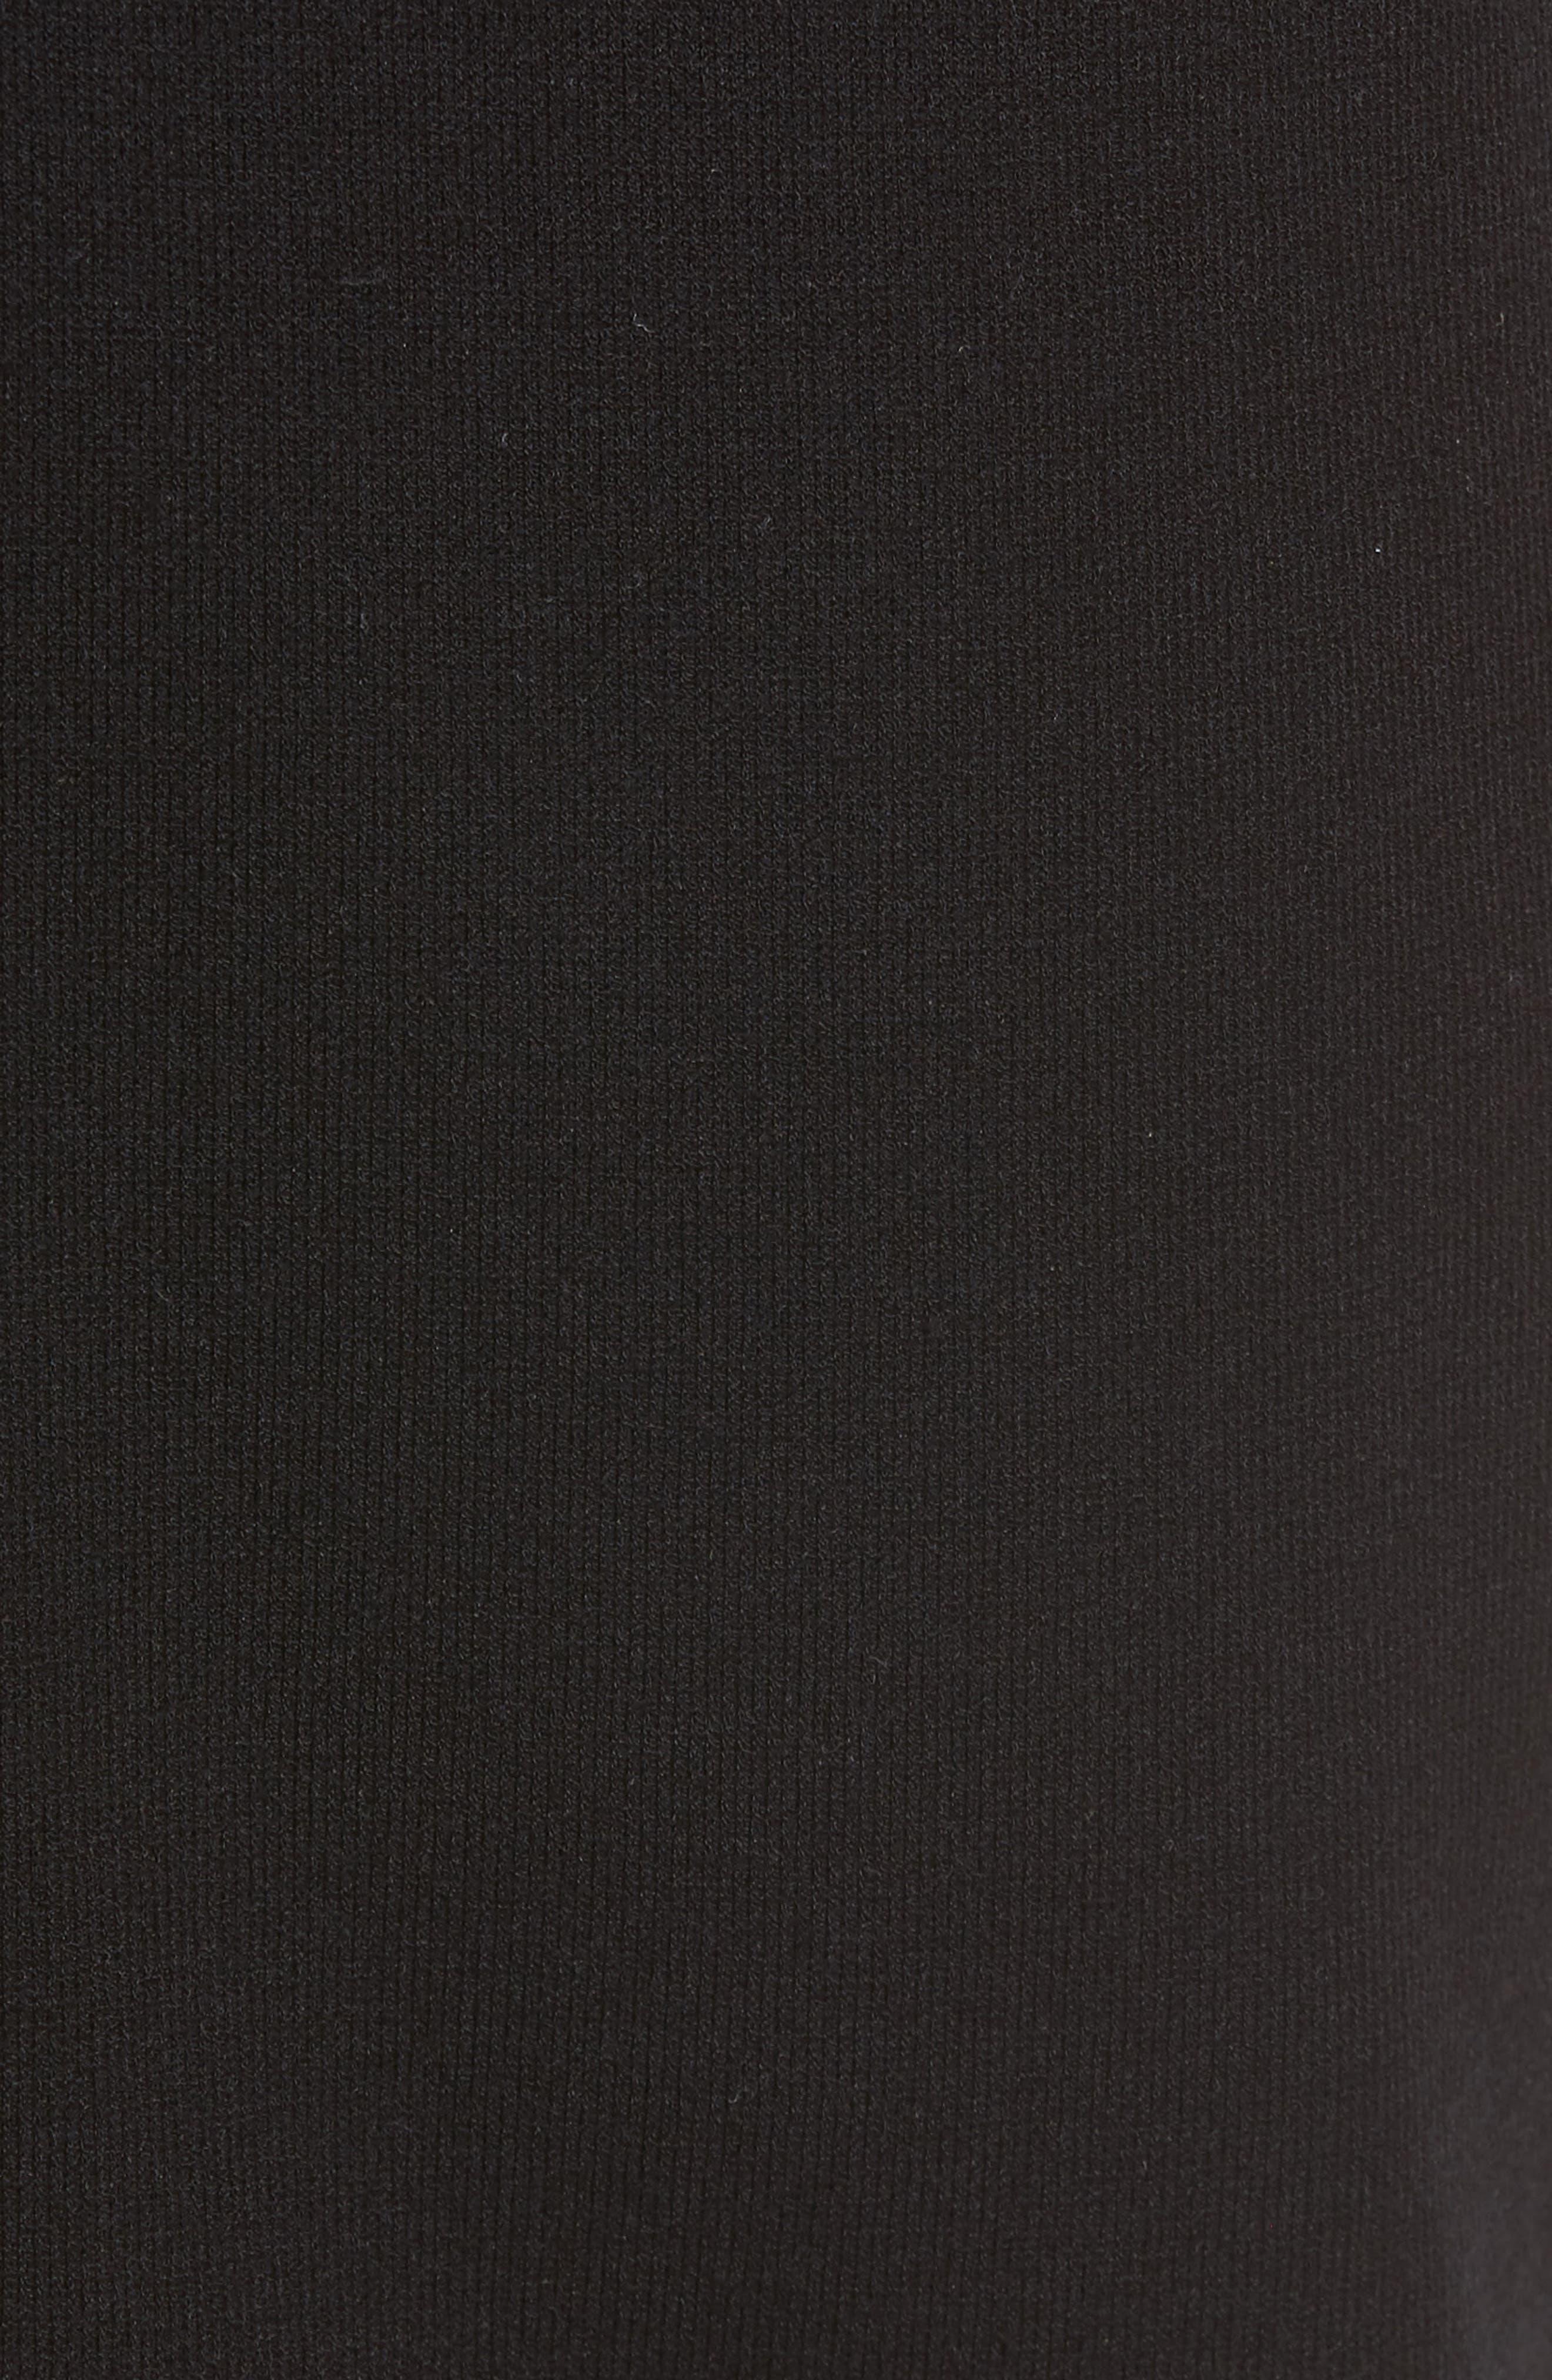 Slim Fit Jogger Pants,                             Alternate thumbnail 5, color,                             Black